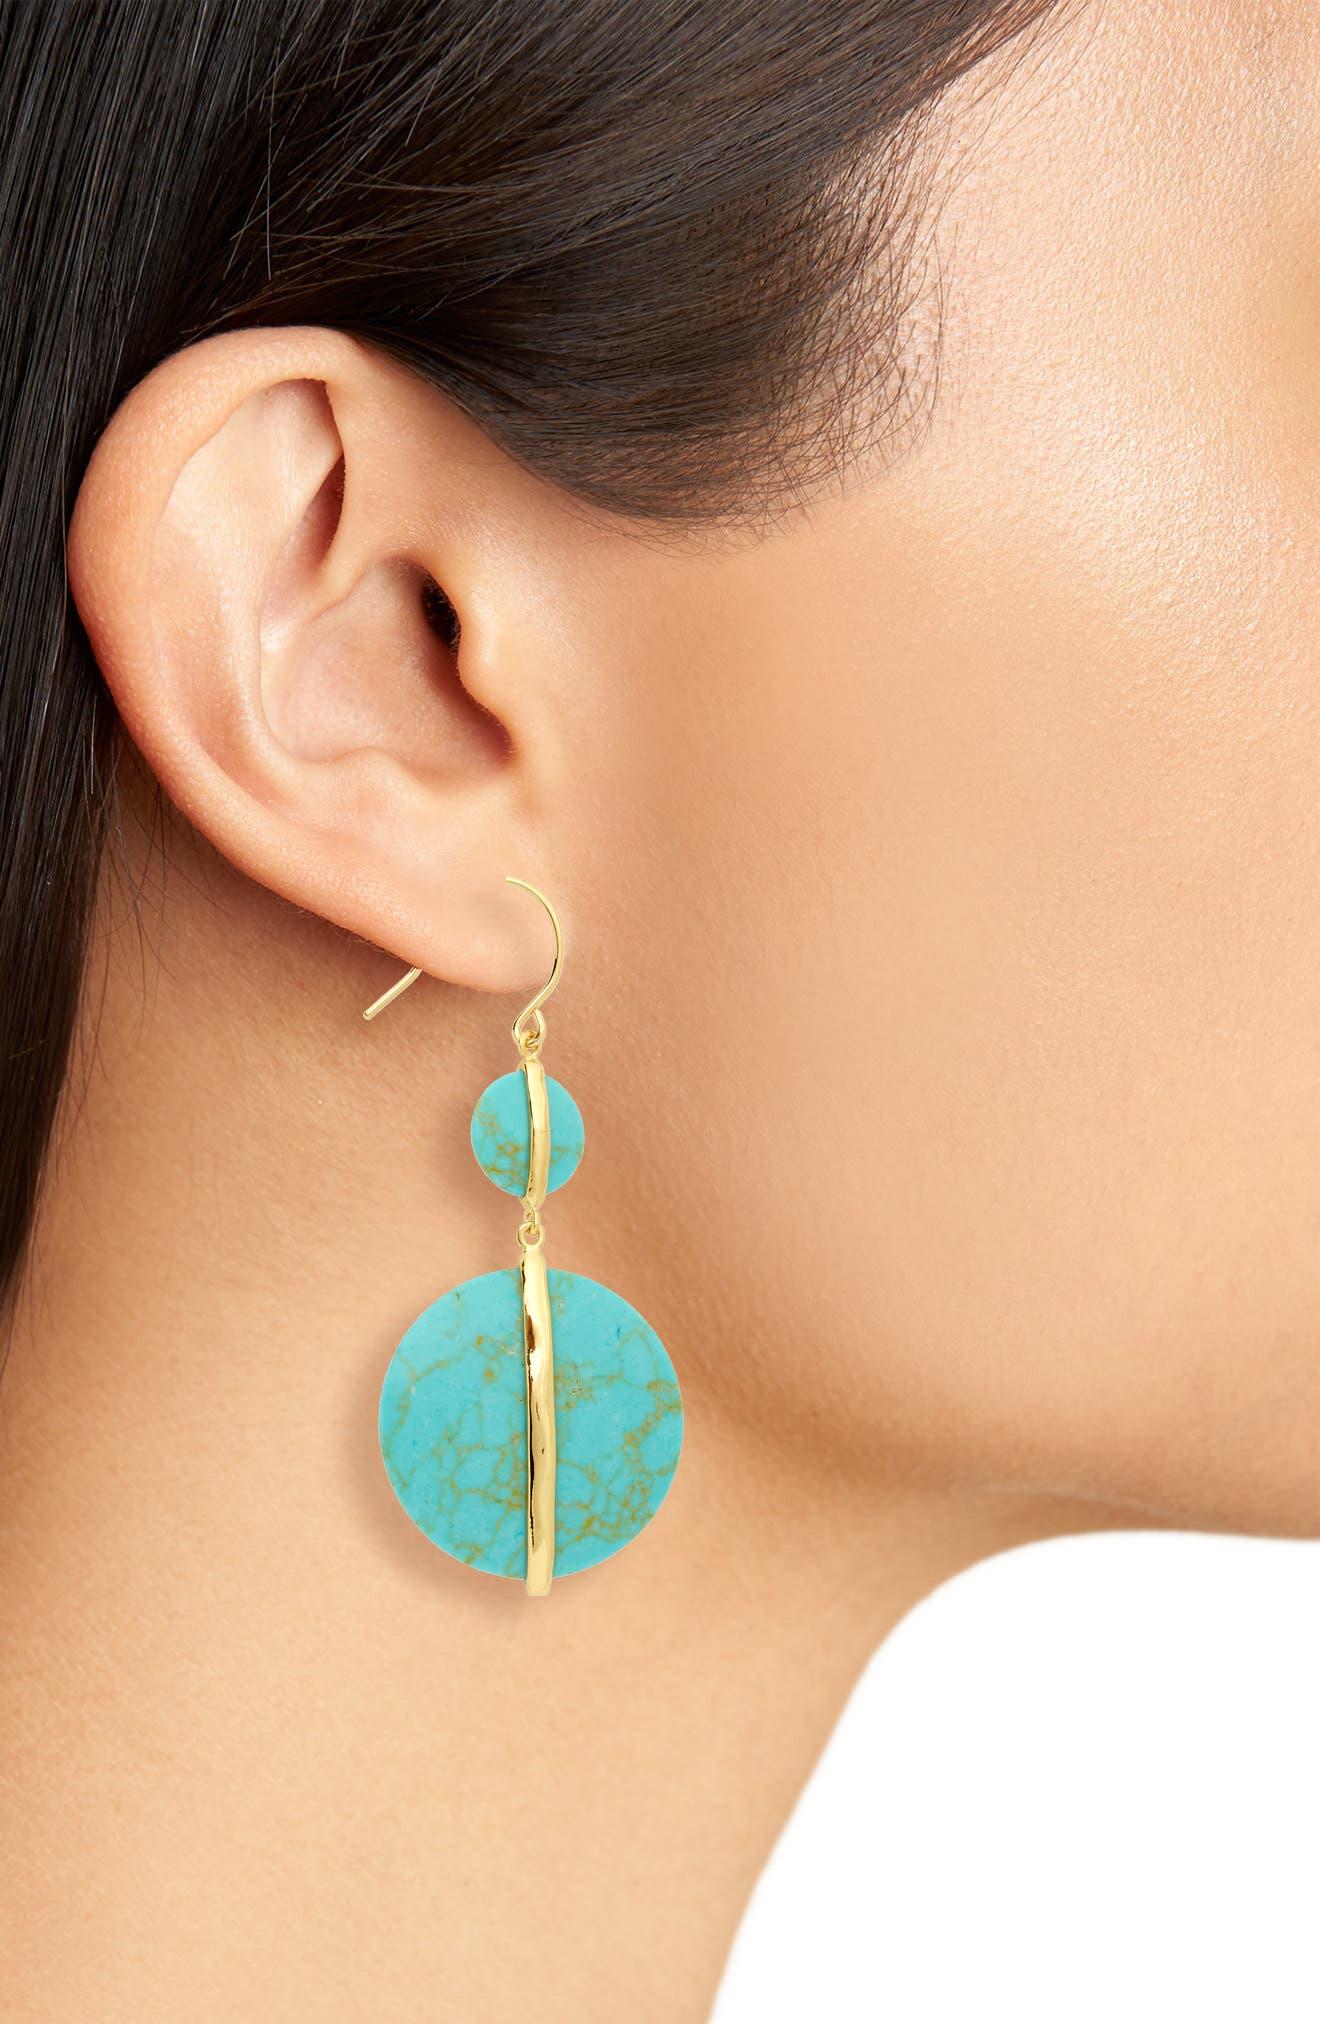 Brinn Drop Earrings,                             Alternate thumbnail 2, color,                             Green Turquoise